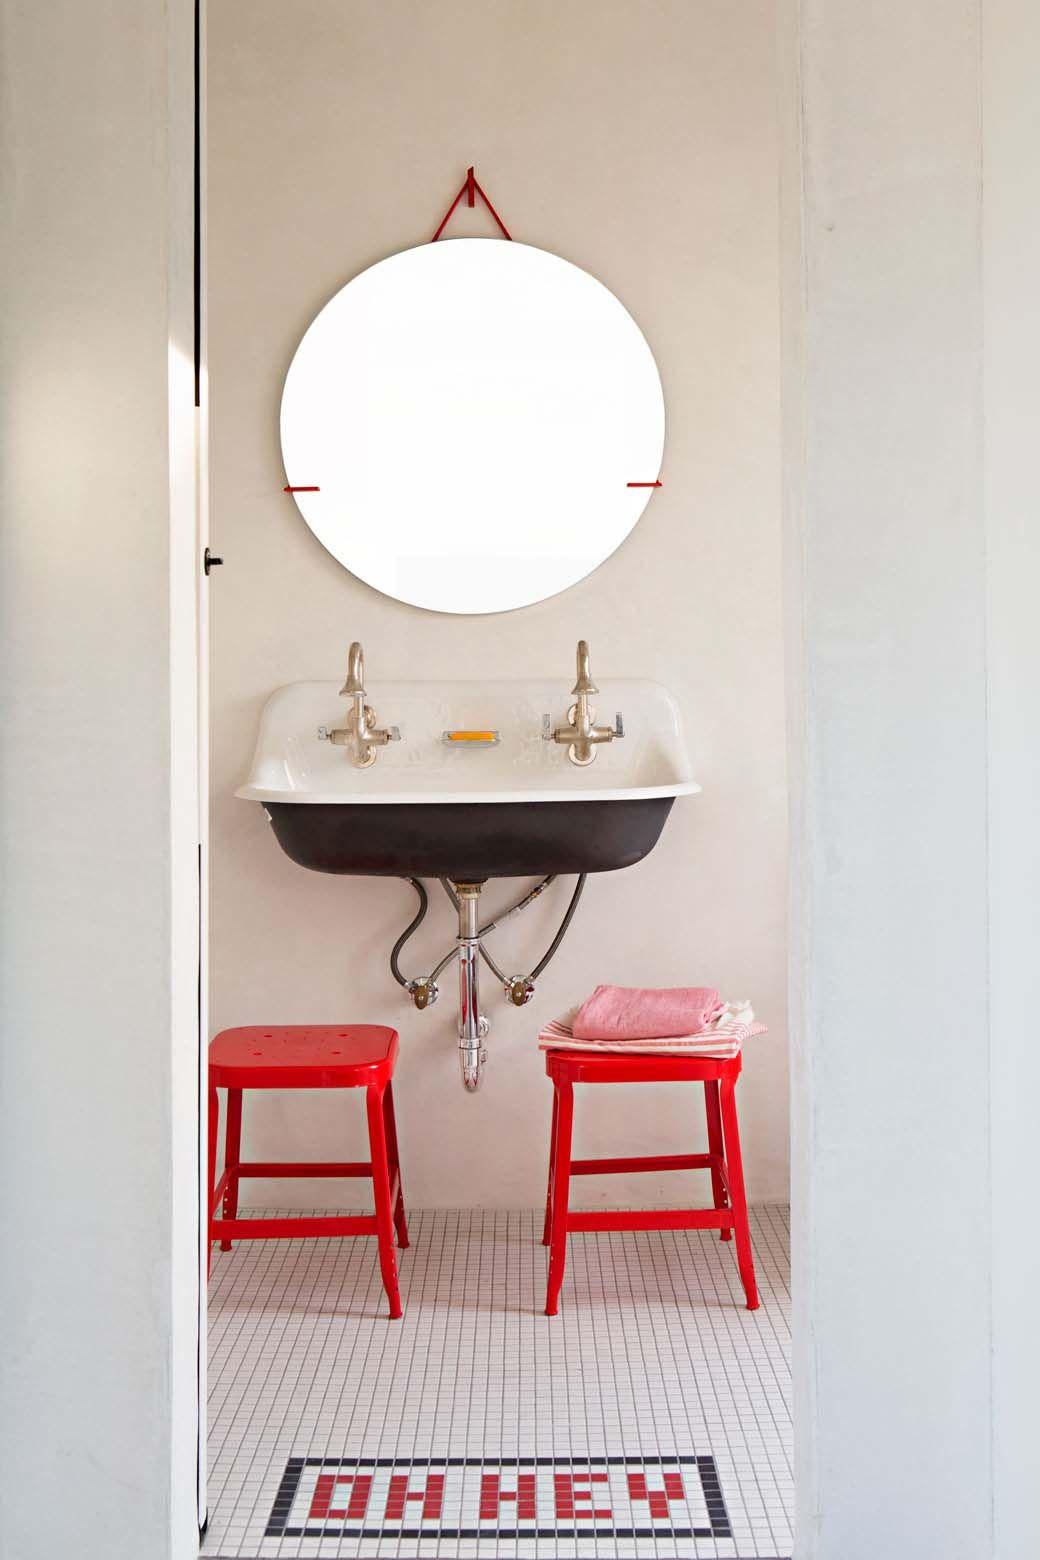 Chic modern farmhouse in Newport Beach with emphasis on entertaining on bathroom flooring, bathroom countertops, bathroom plans, bathroom tubs, bathroom windows, bathroom paint, bathroom renovation, bathroom installation, bathroom plumbing, bathroom showers, bathroom hardwood floors, bathroom tile, bathroom painting, bathroom remodelers, bathroom decorating, bathroom vanities, bathroom remodels for small bathrooms, bathroom design, bathroom upgrades, bathroom makeovers,